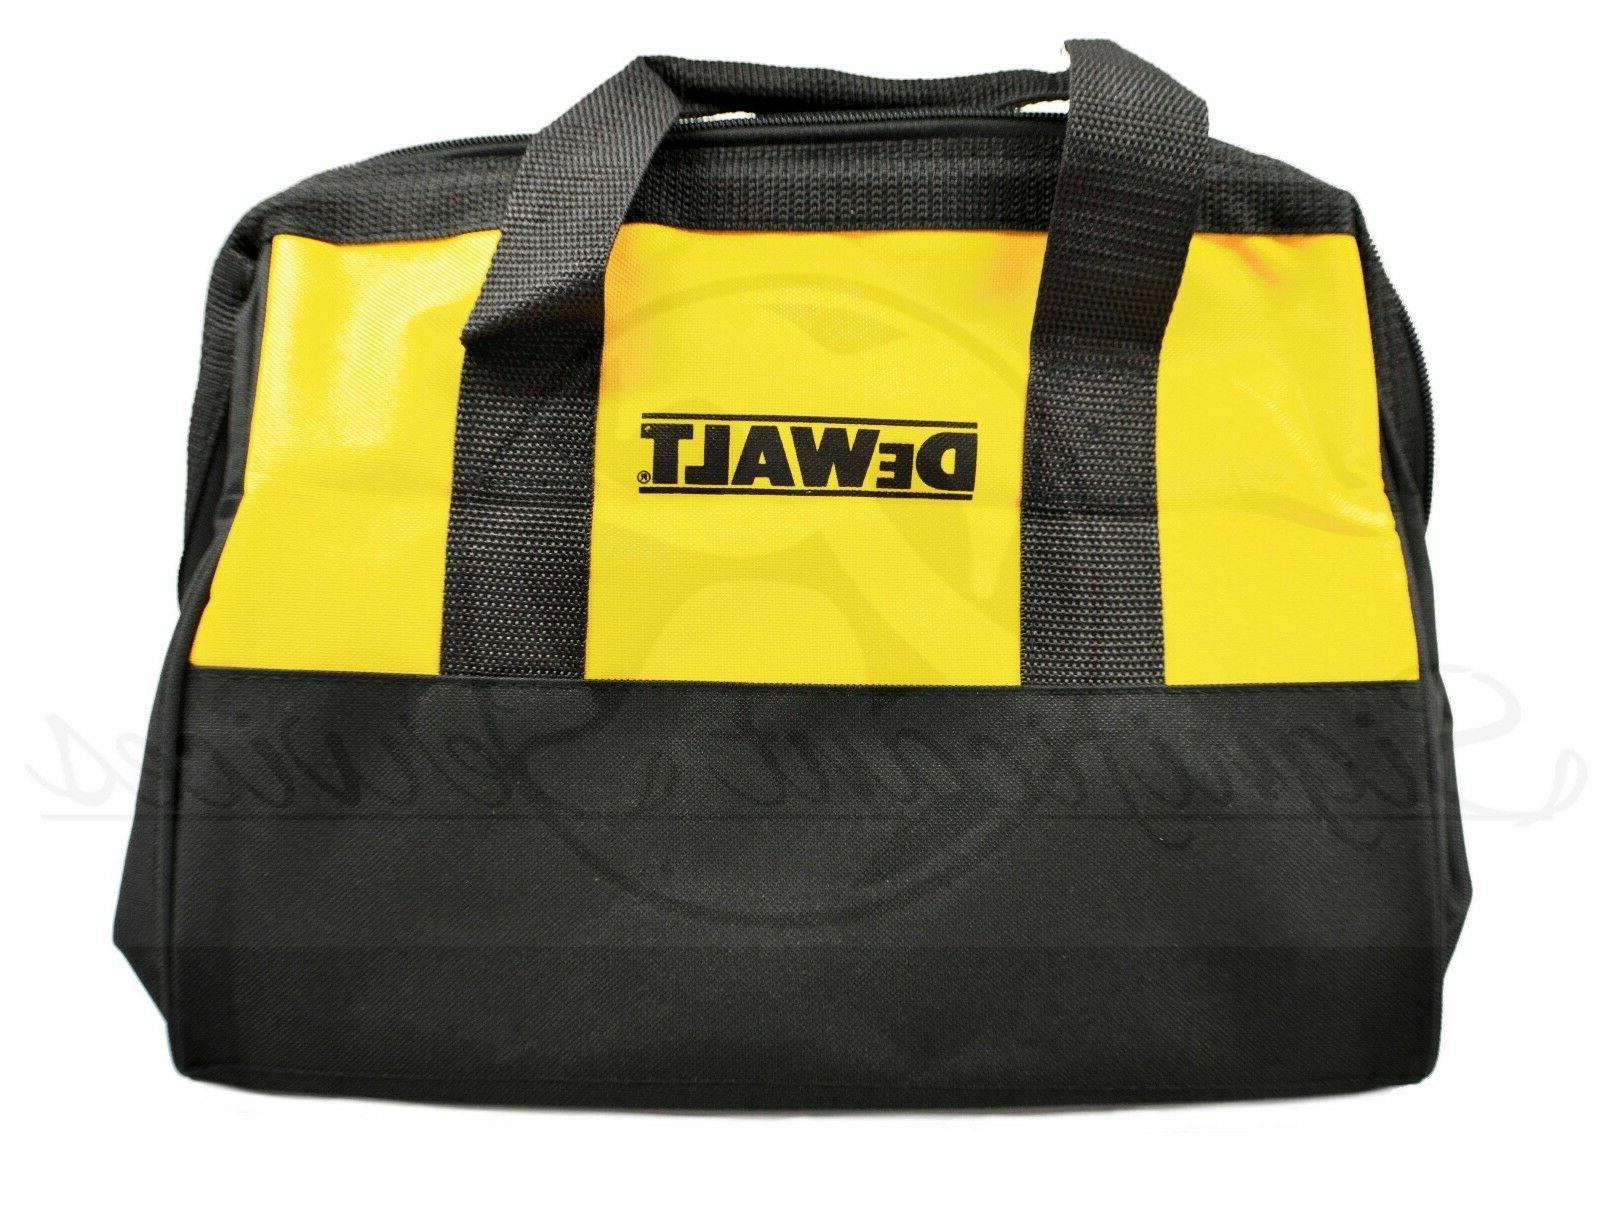 "NEW DeWALT 13"" Heavy Duty Nylon Canvas Contractor Tool Bag P"